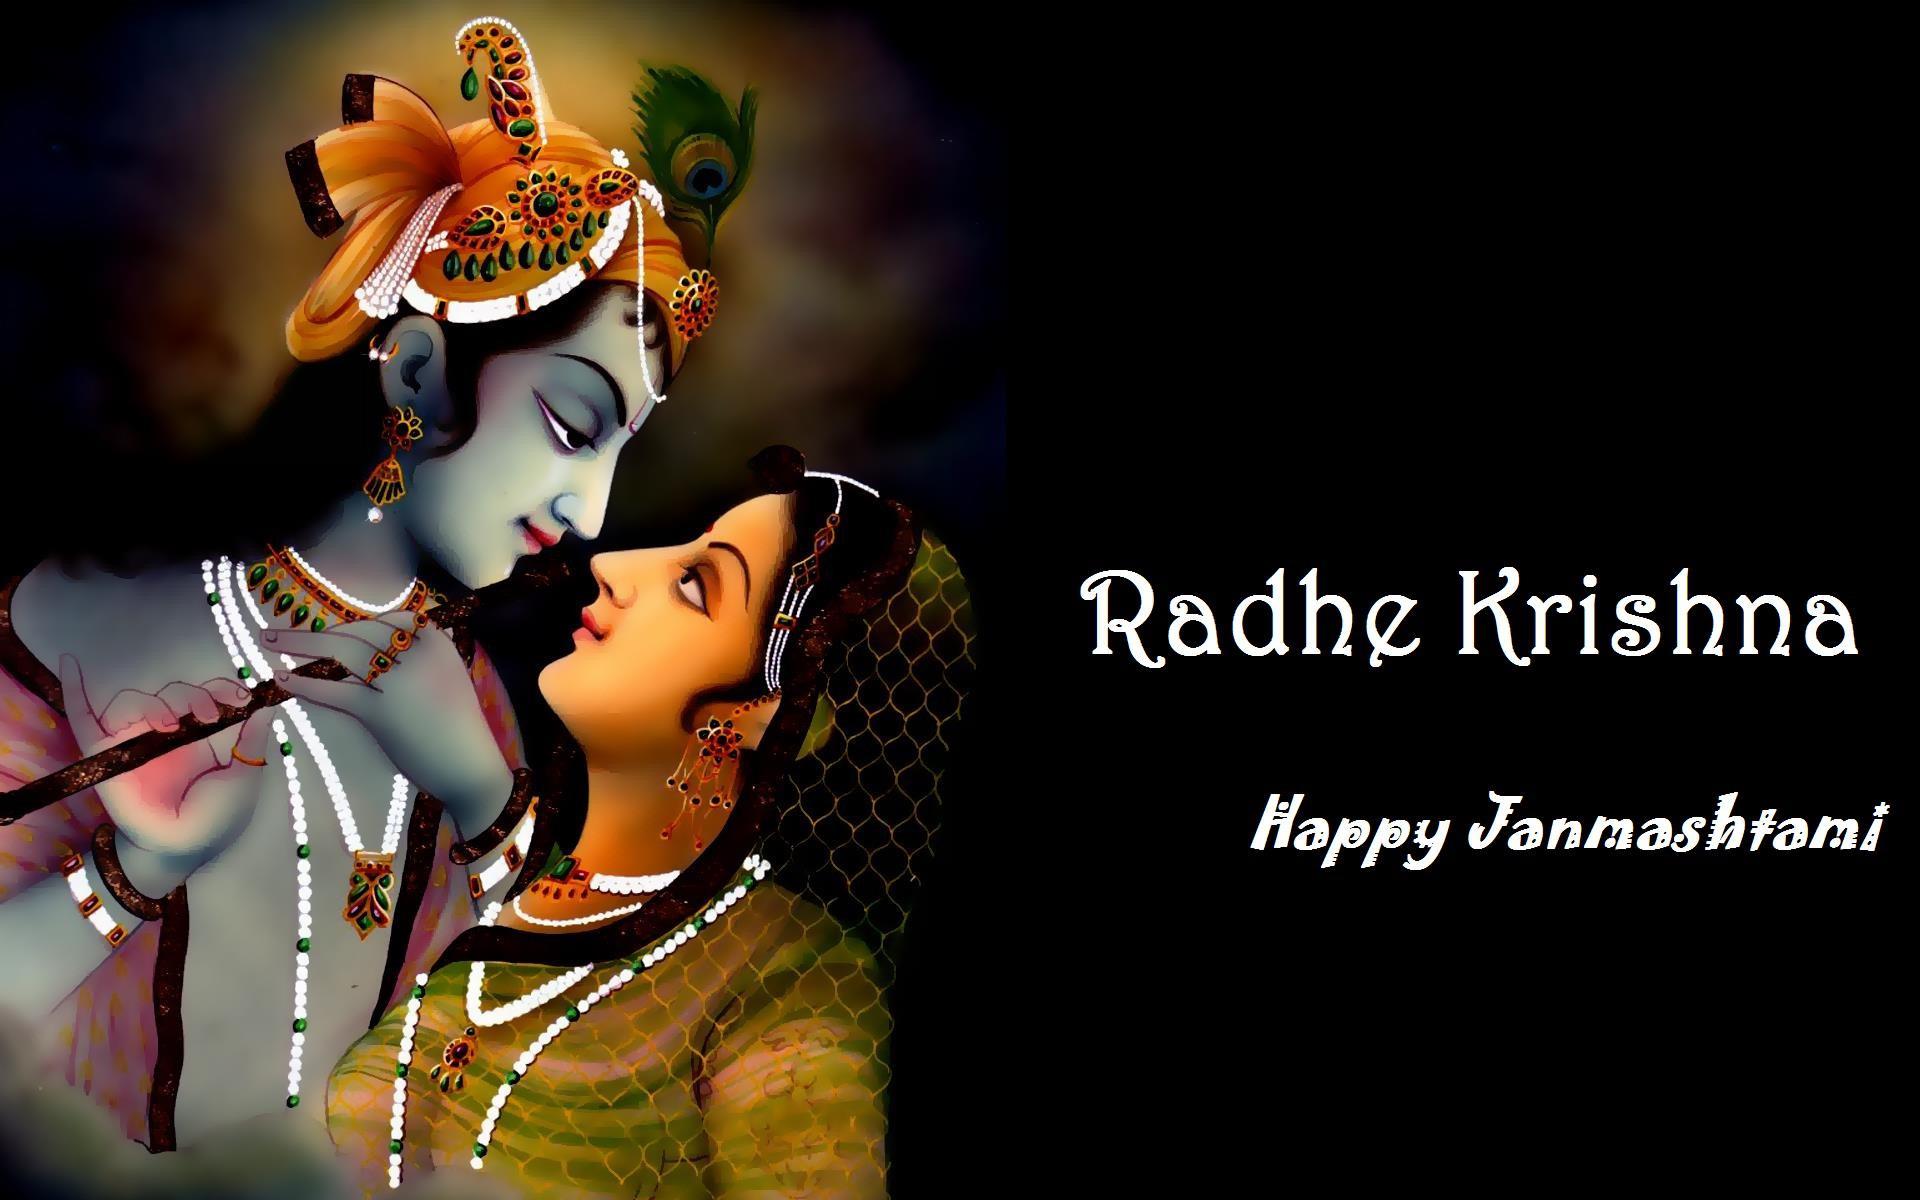 Happy Janmashtami Festival Blue Hd Wallpaper Rh Whoa In